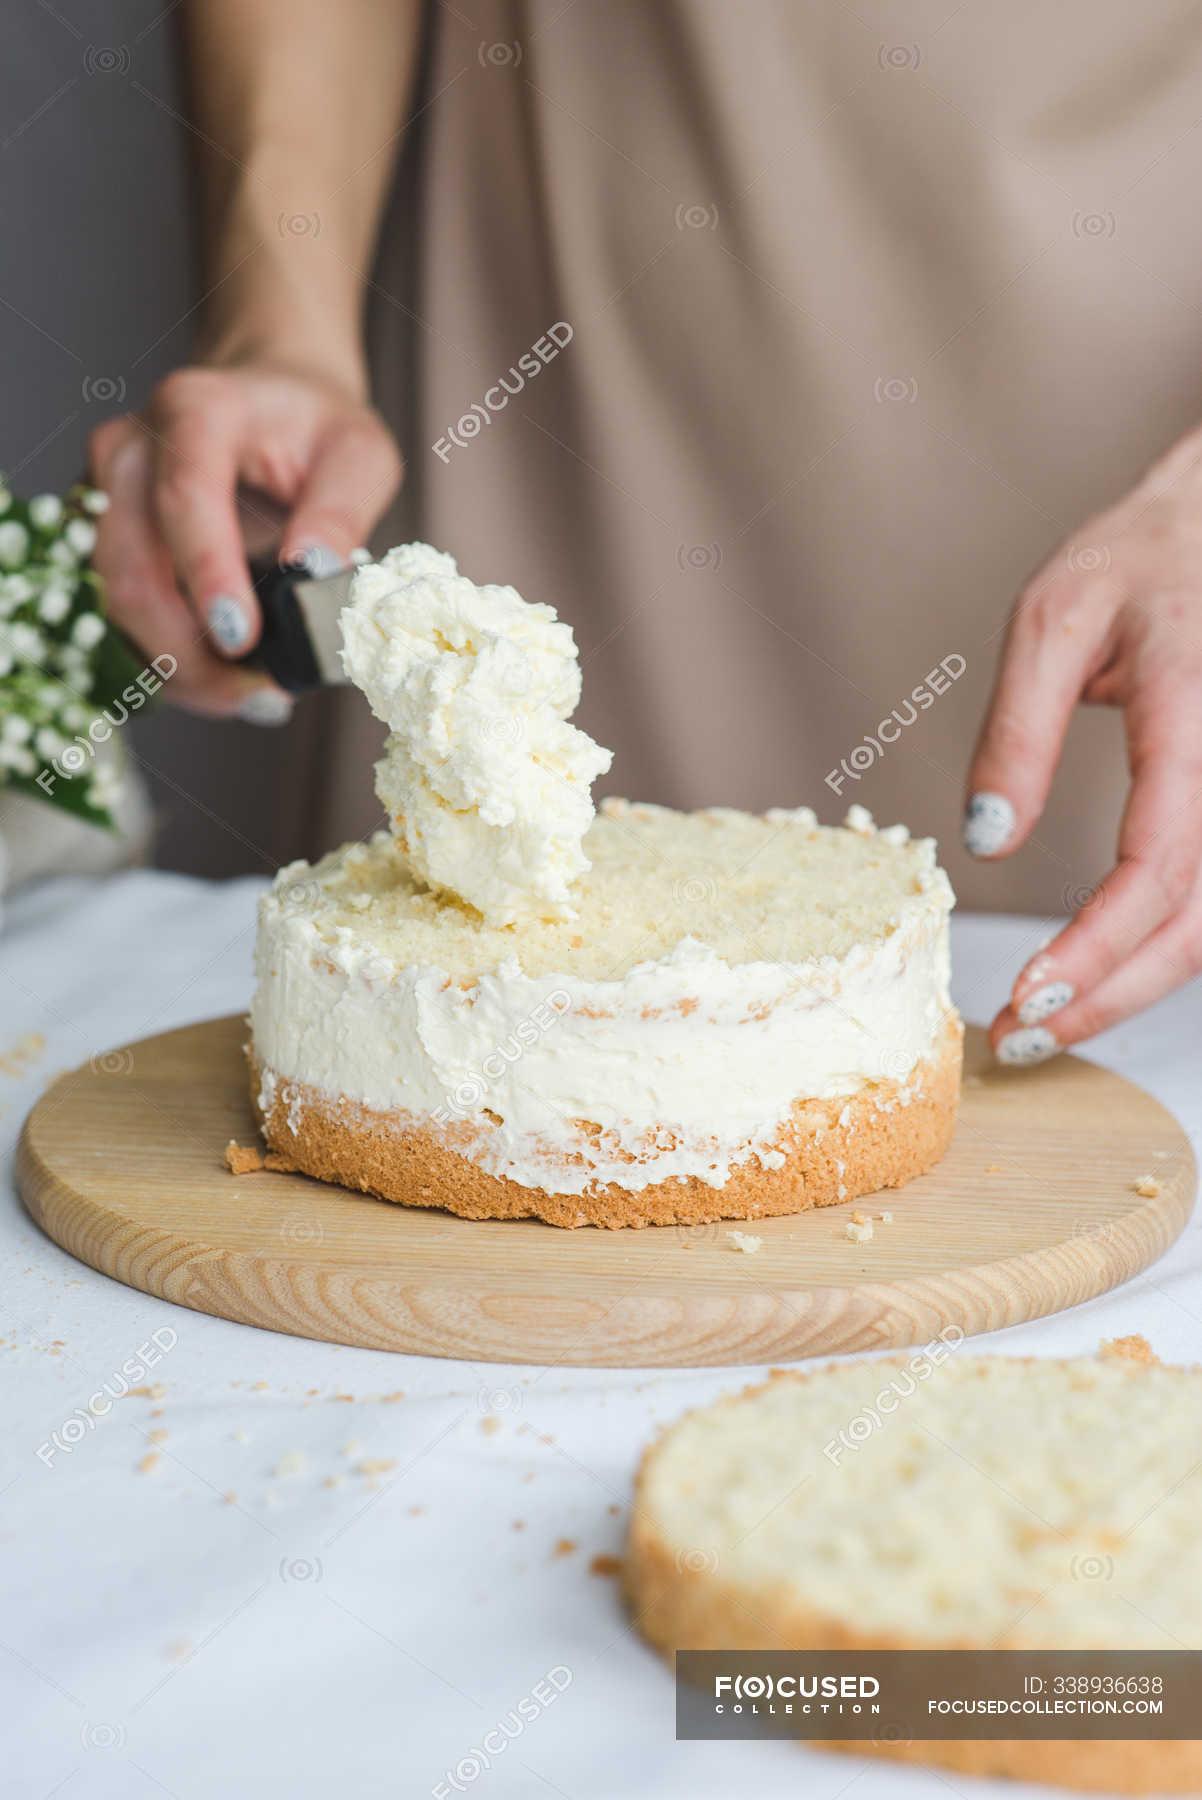 Astonishing Pastry Chef Preparing Naked Wedding Birthday Cake Candy Maker Personalised Birthday Cards Petedlily Jamesorg